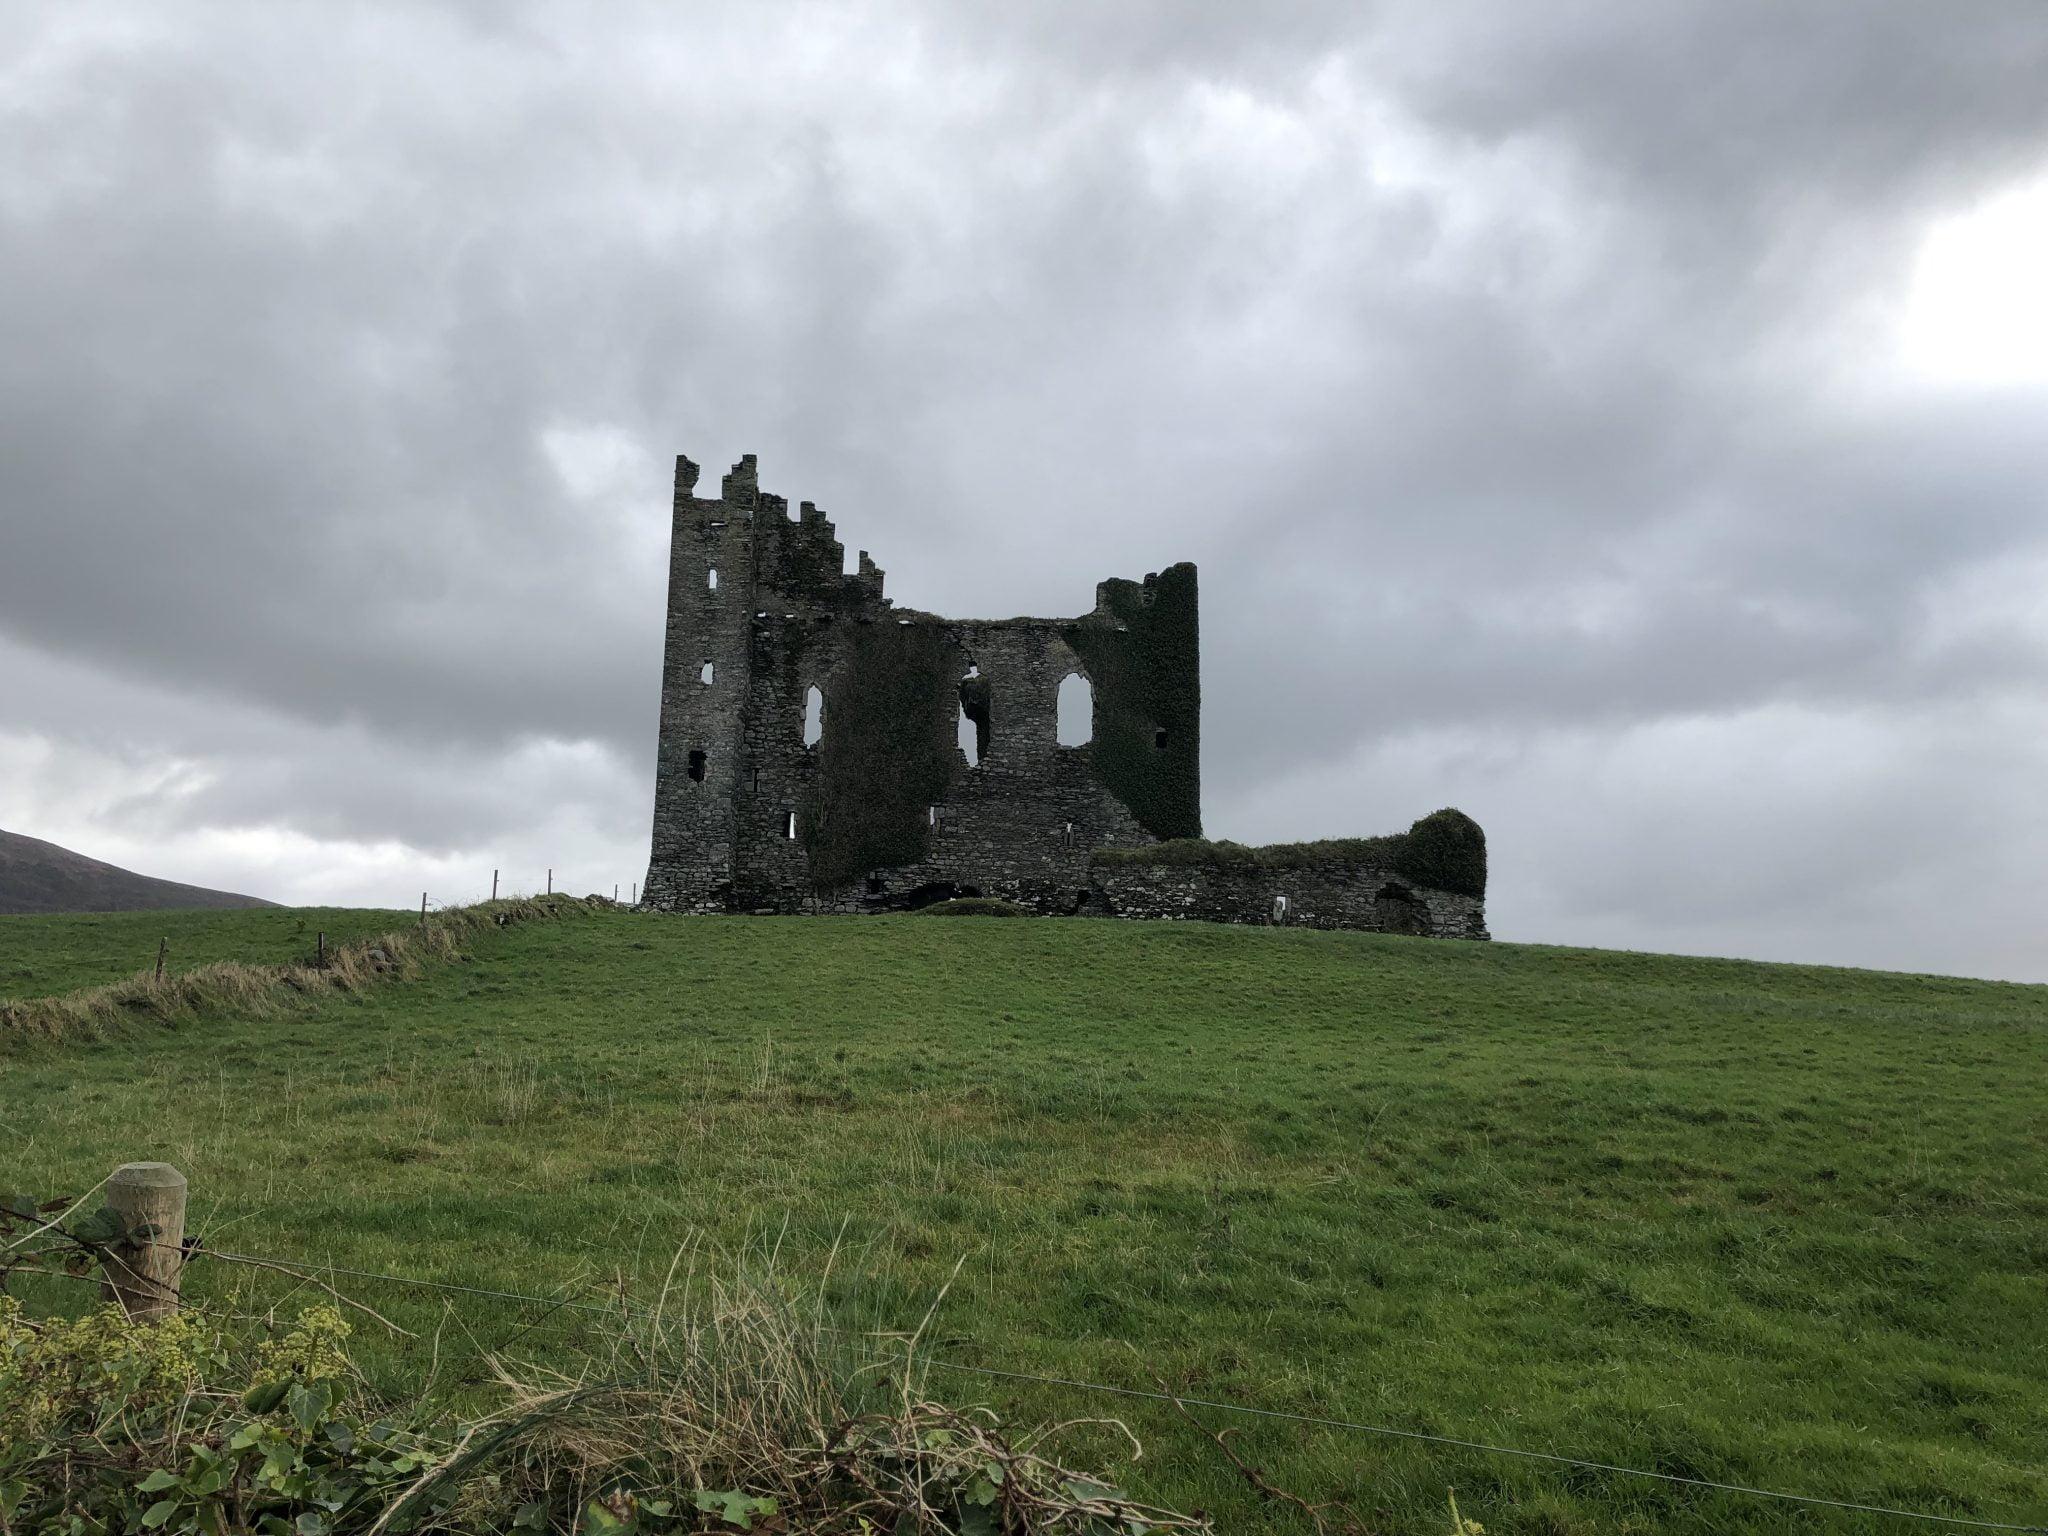 Ballycarbery Castle, near Cahersiveen, County Kerry, Ireland